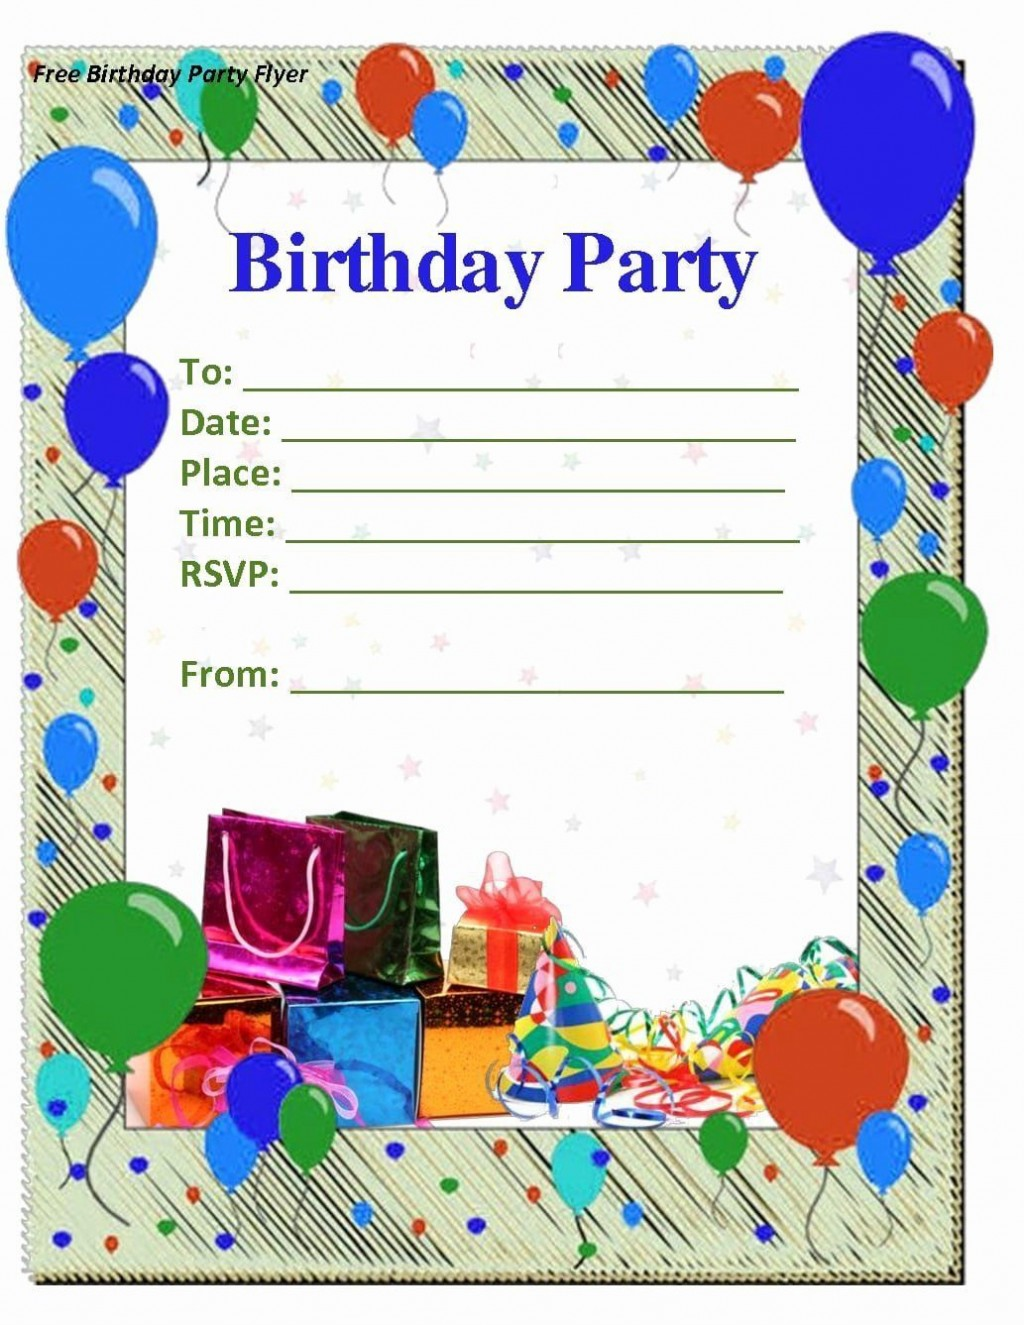 001 Amazing Birthday Invitation Template Word 2020 Highest Quality Large